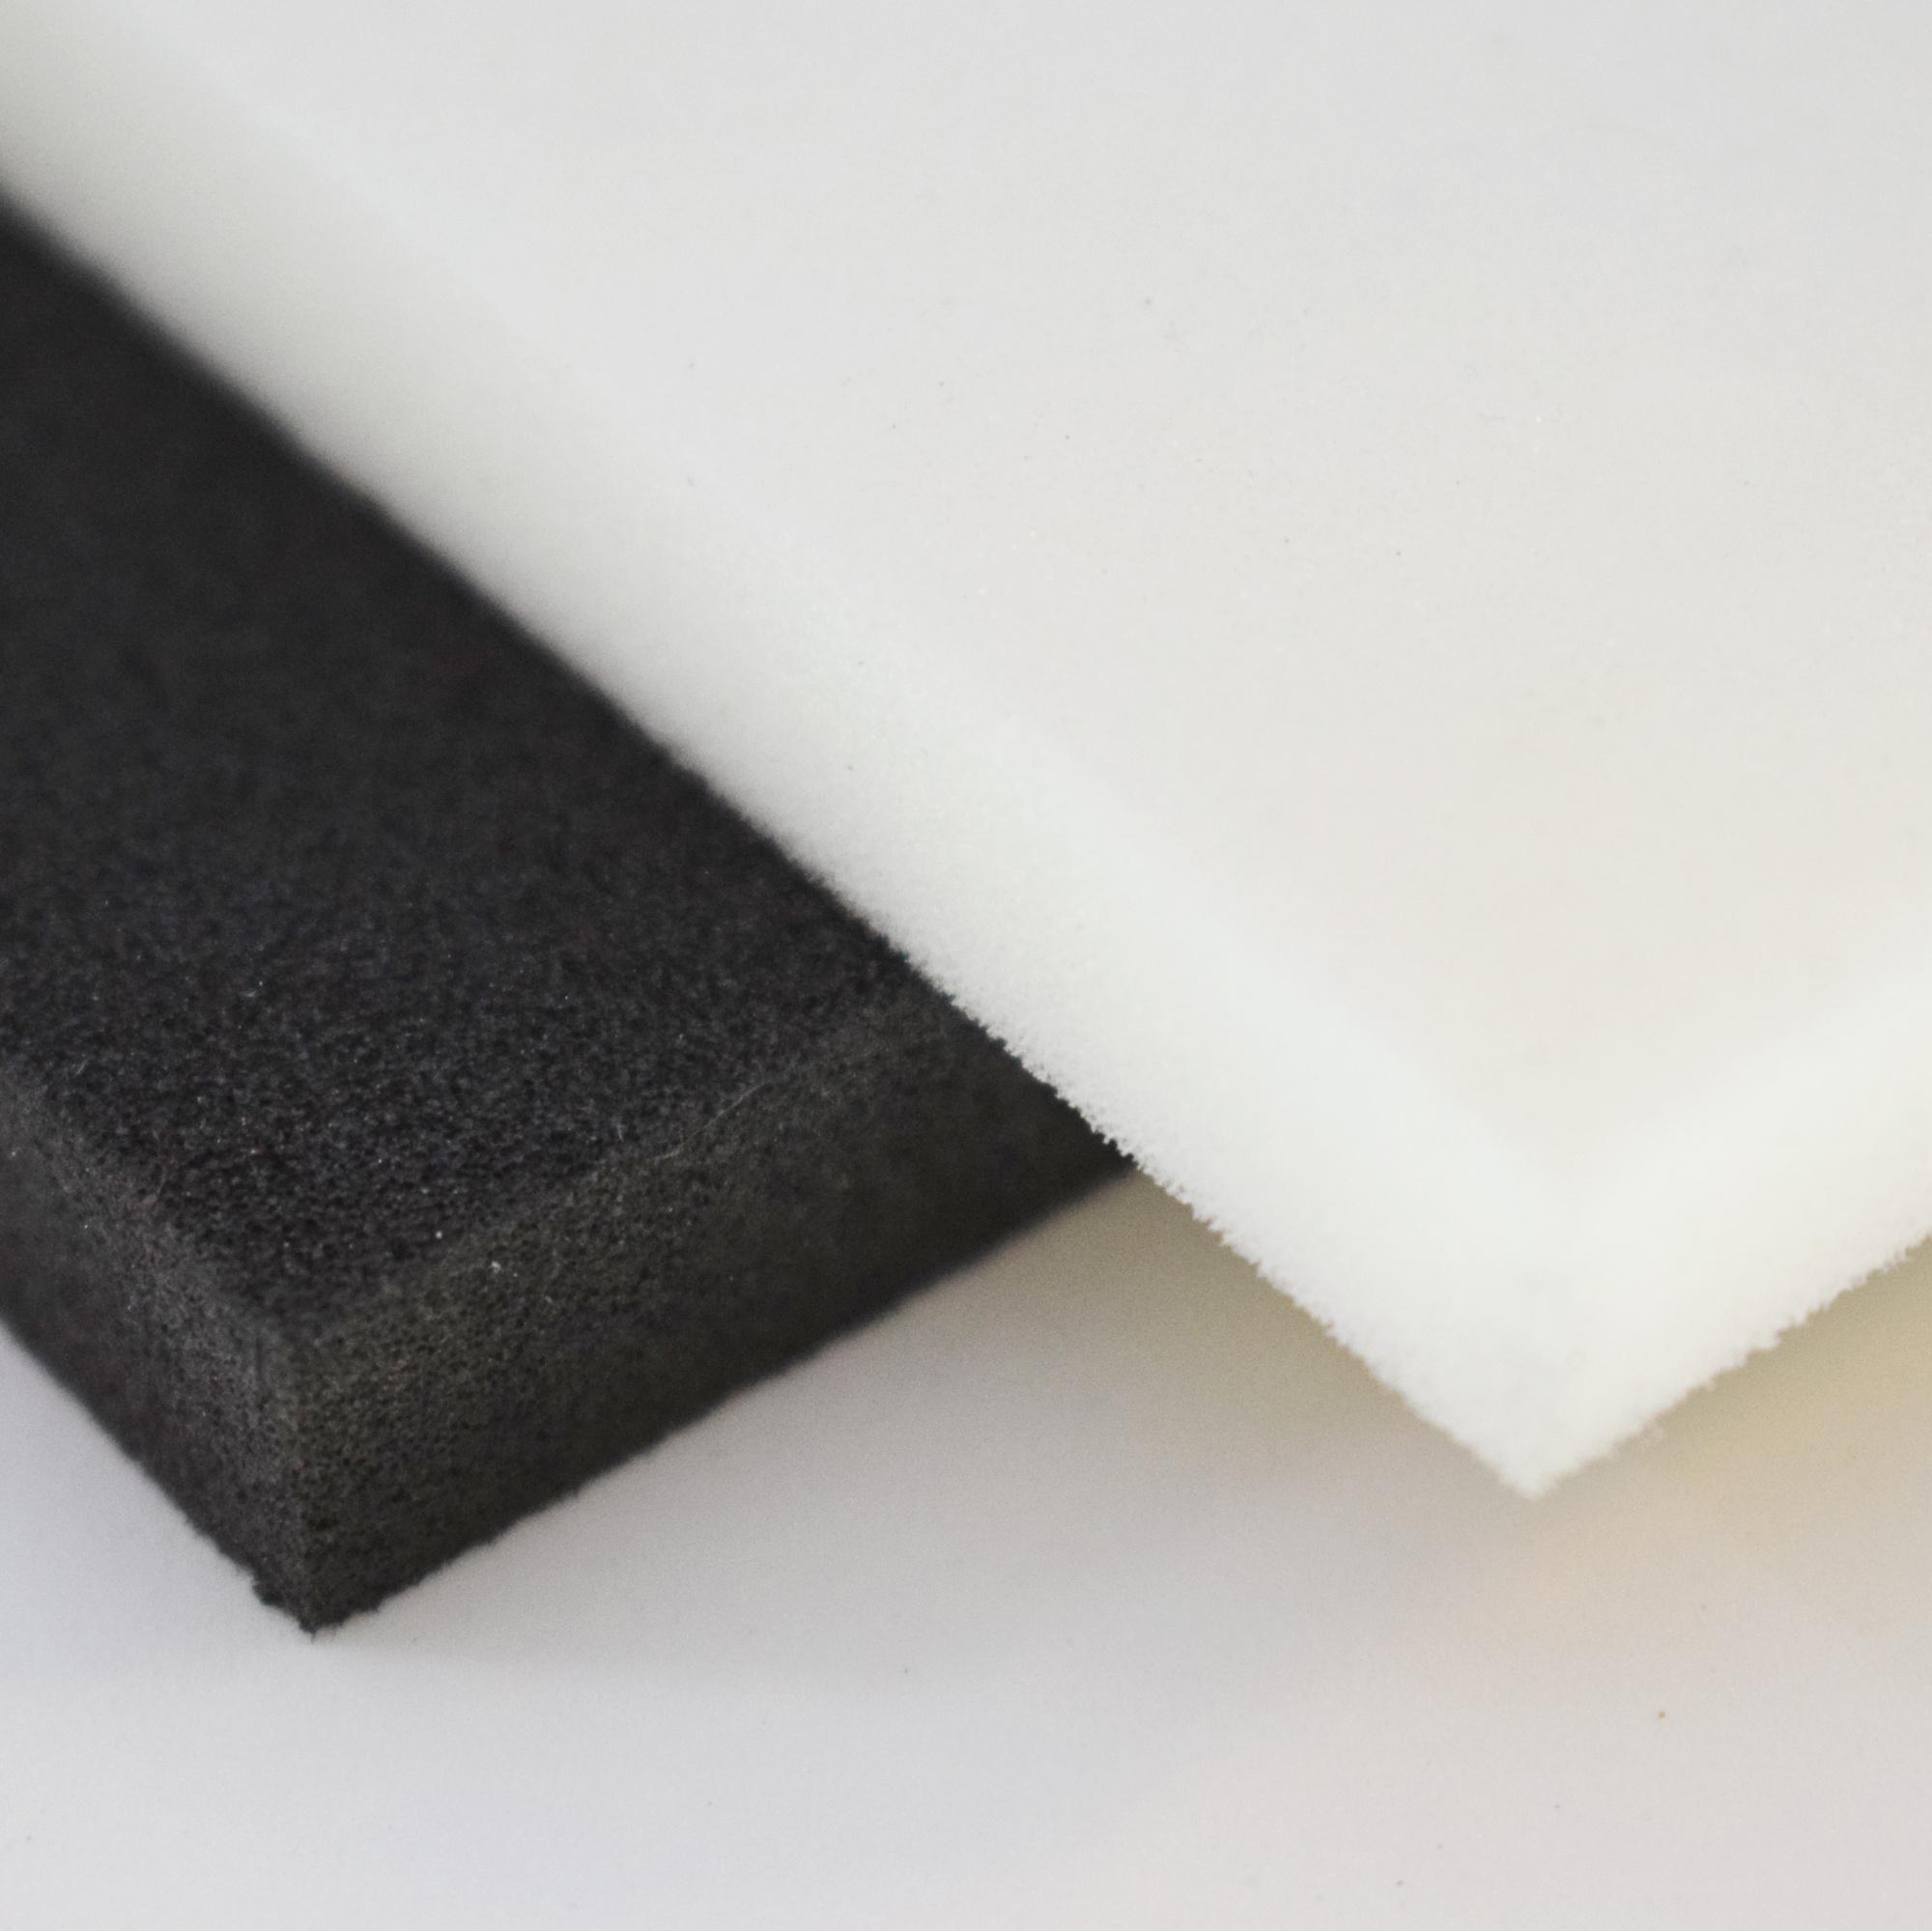 Plastazote Foam Products The Rubber Company